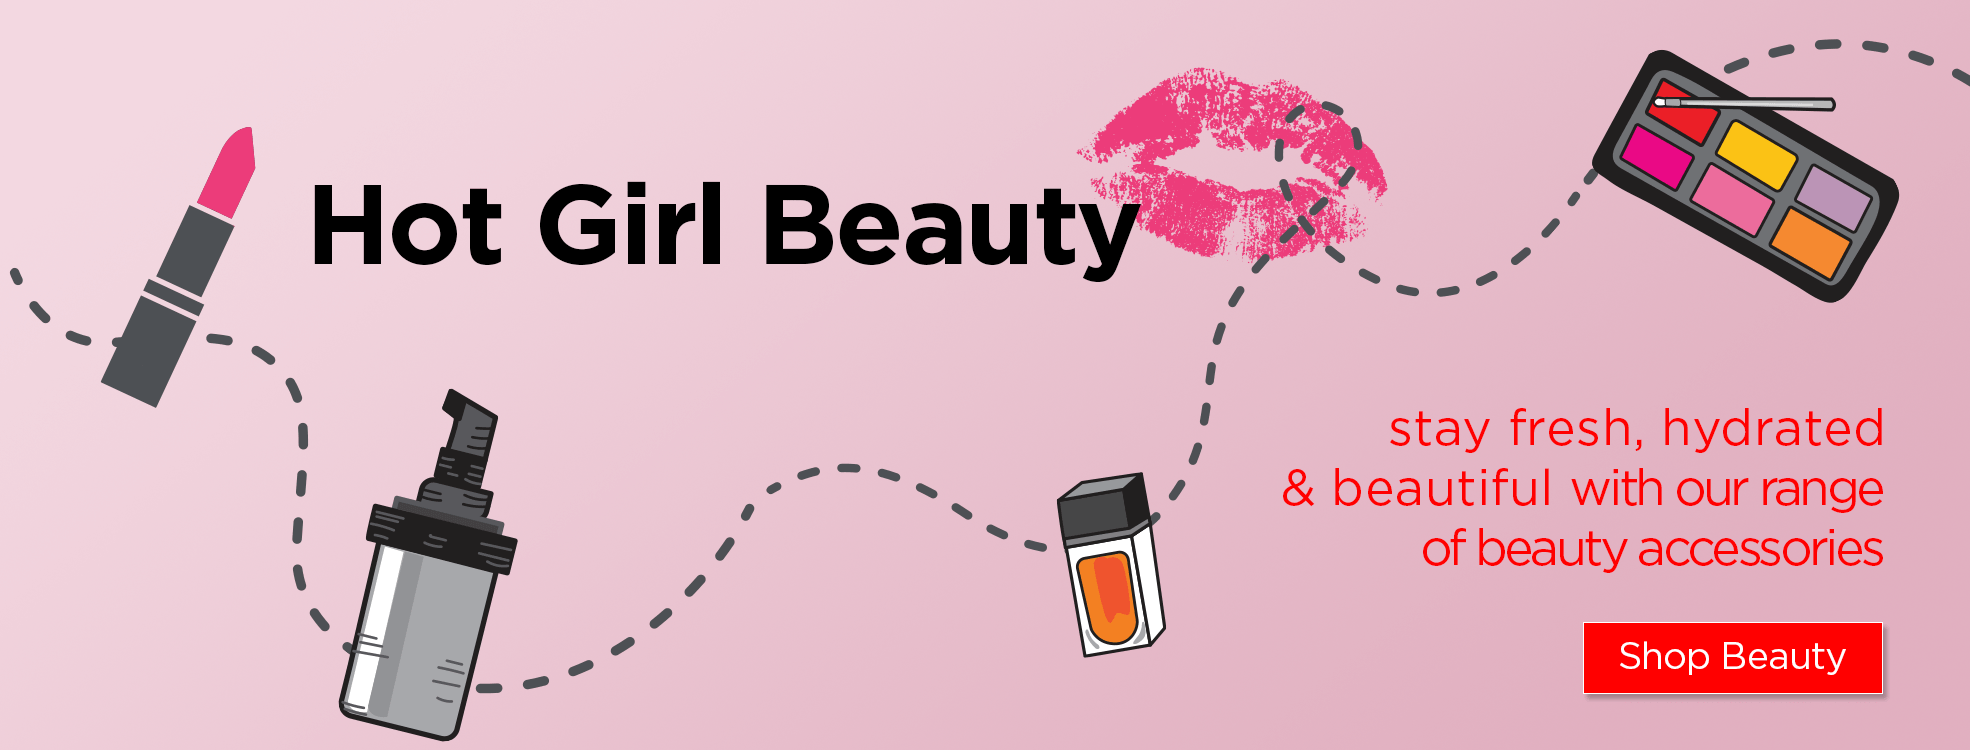 Hot Girl Beaty - beauty accessories